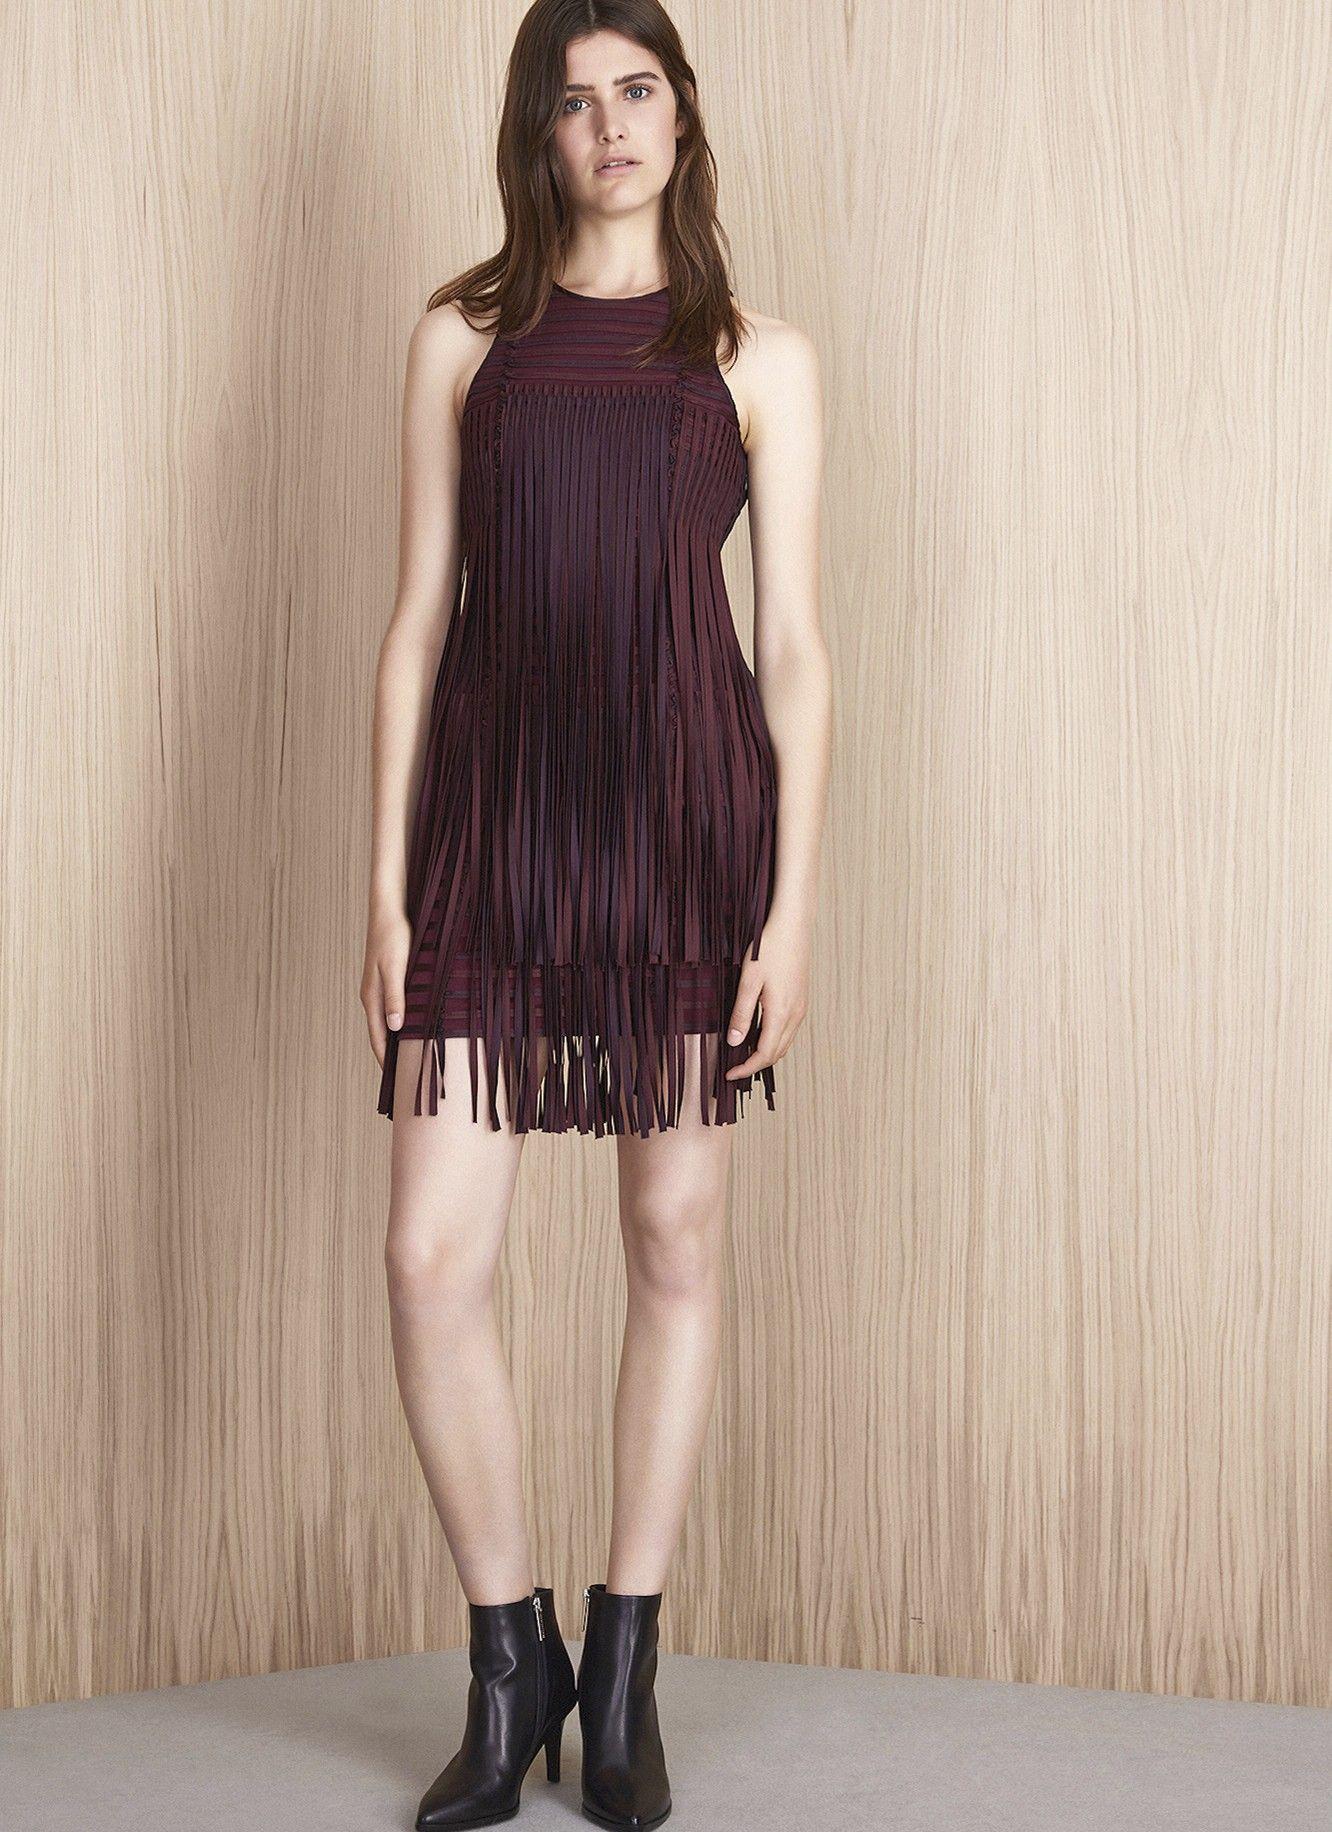 Vestido corto con flecos ad mujer adolfo dominguez for Vestidos adolfo dominguez outlet online